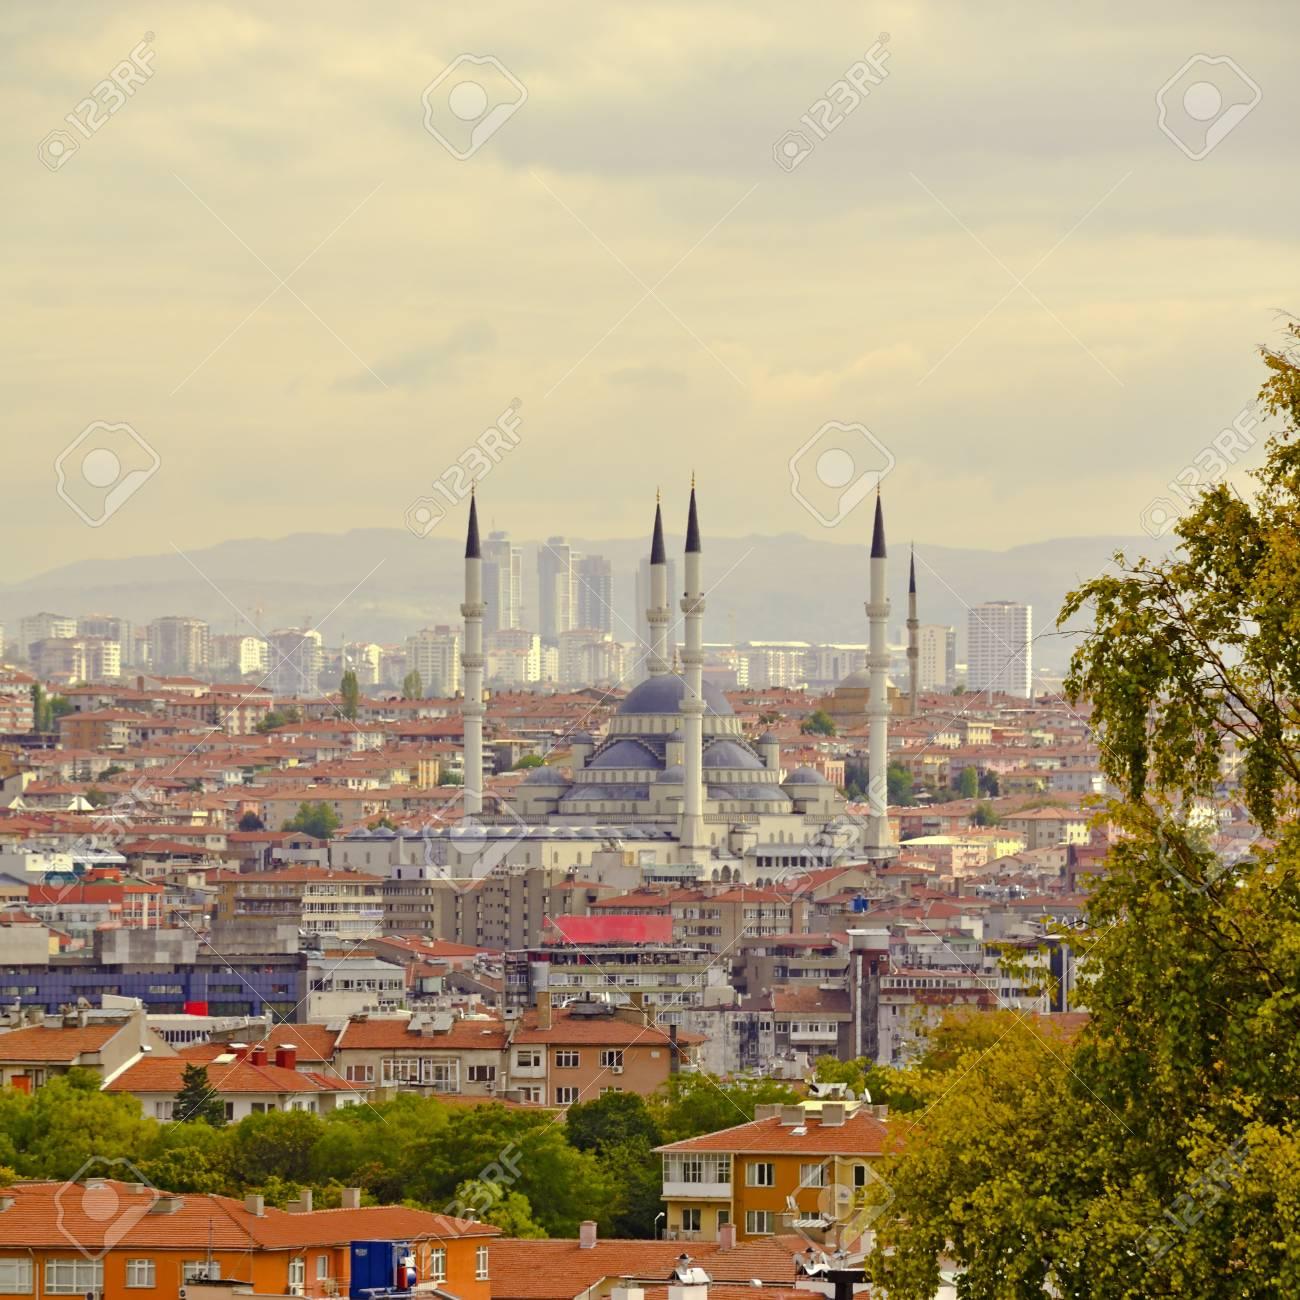 Ankara, Capital city of Turkey in a beautiful autumn day. - 90585929